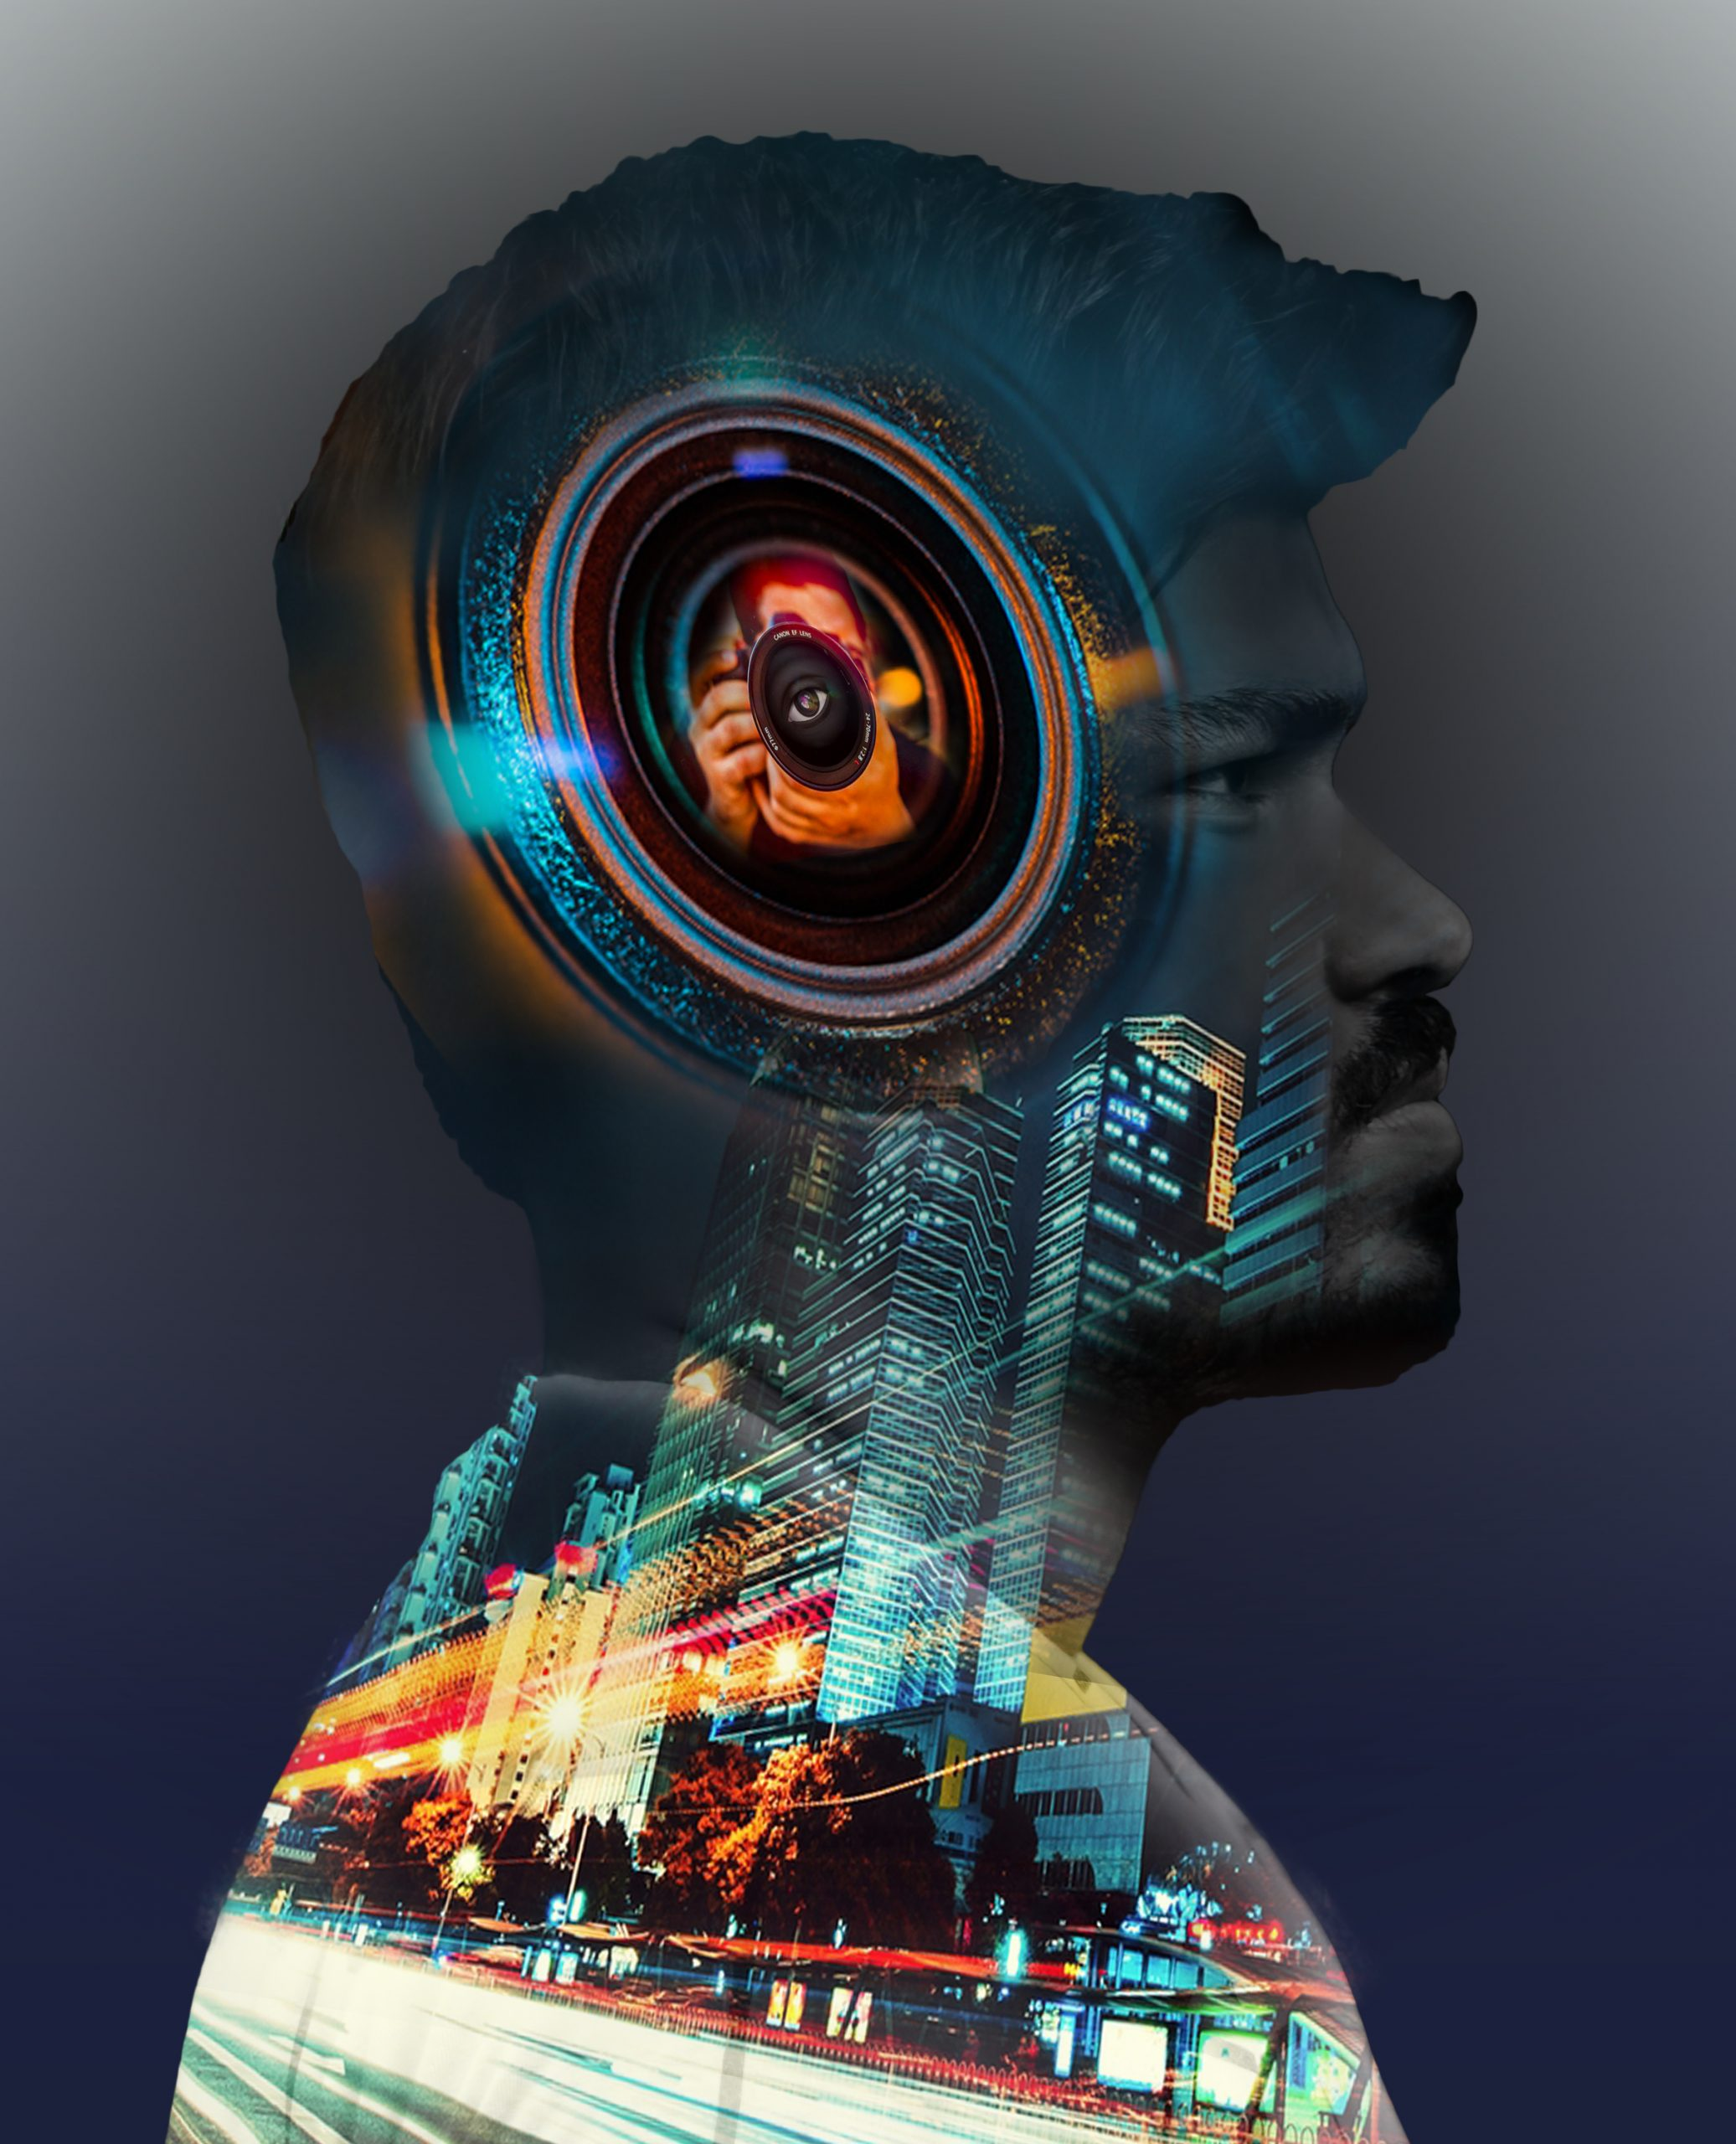 Distortation effect editing